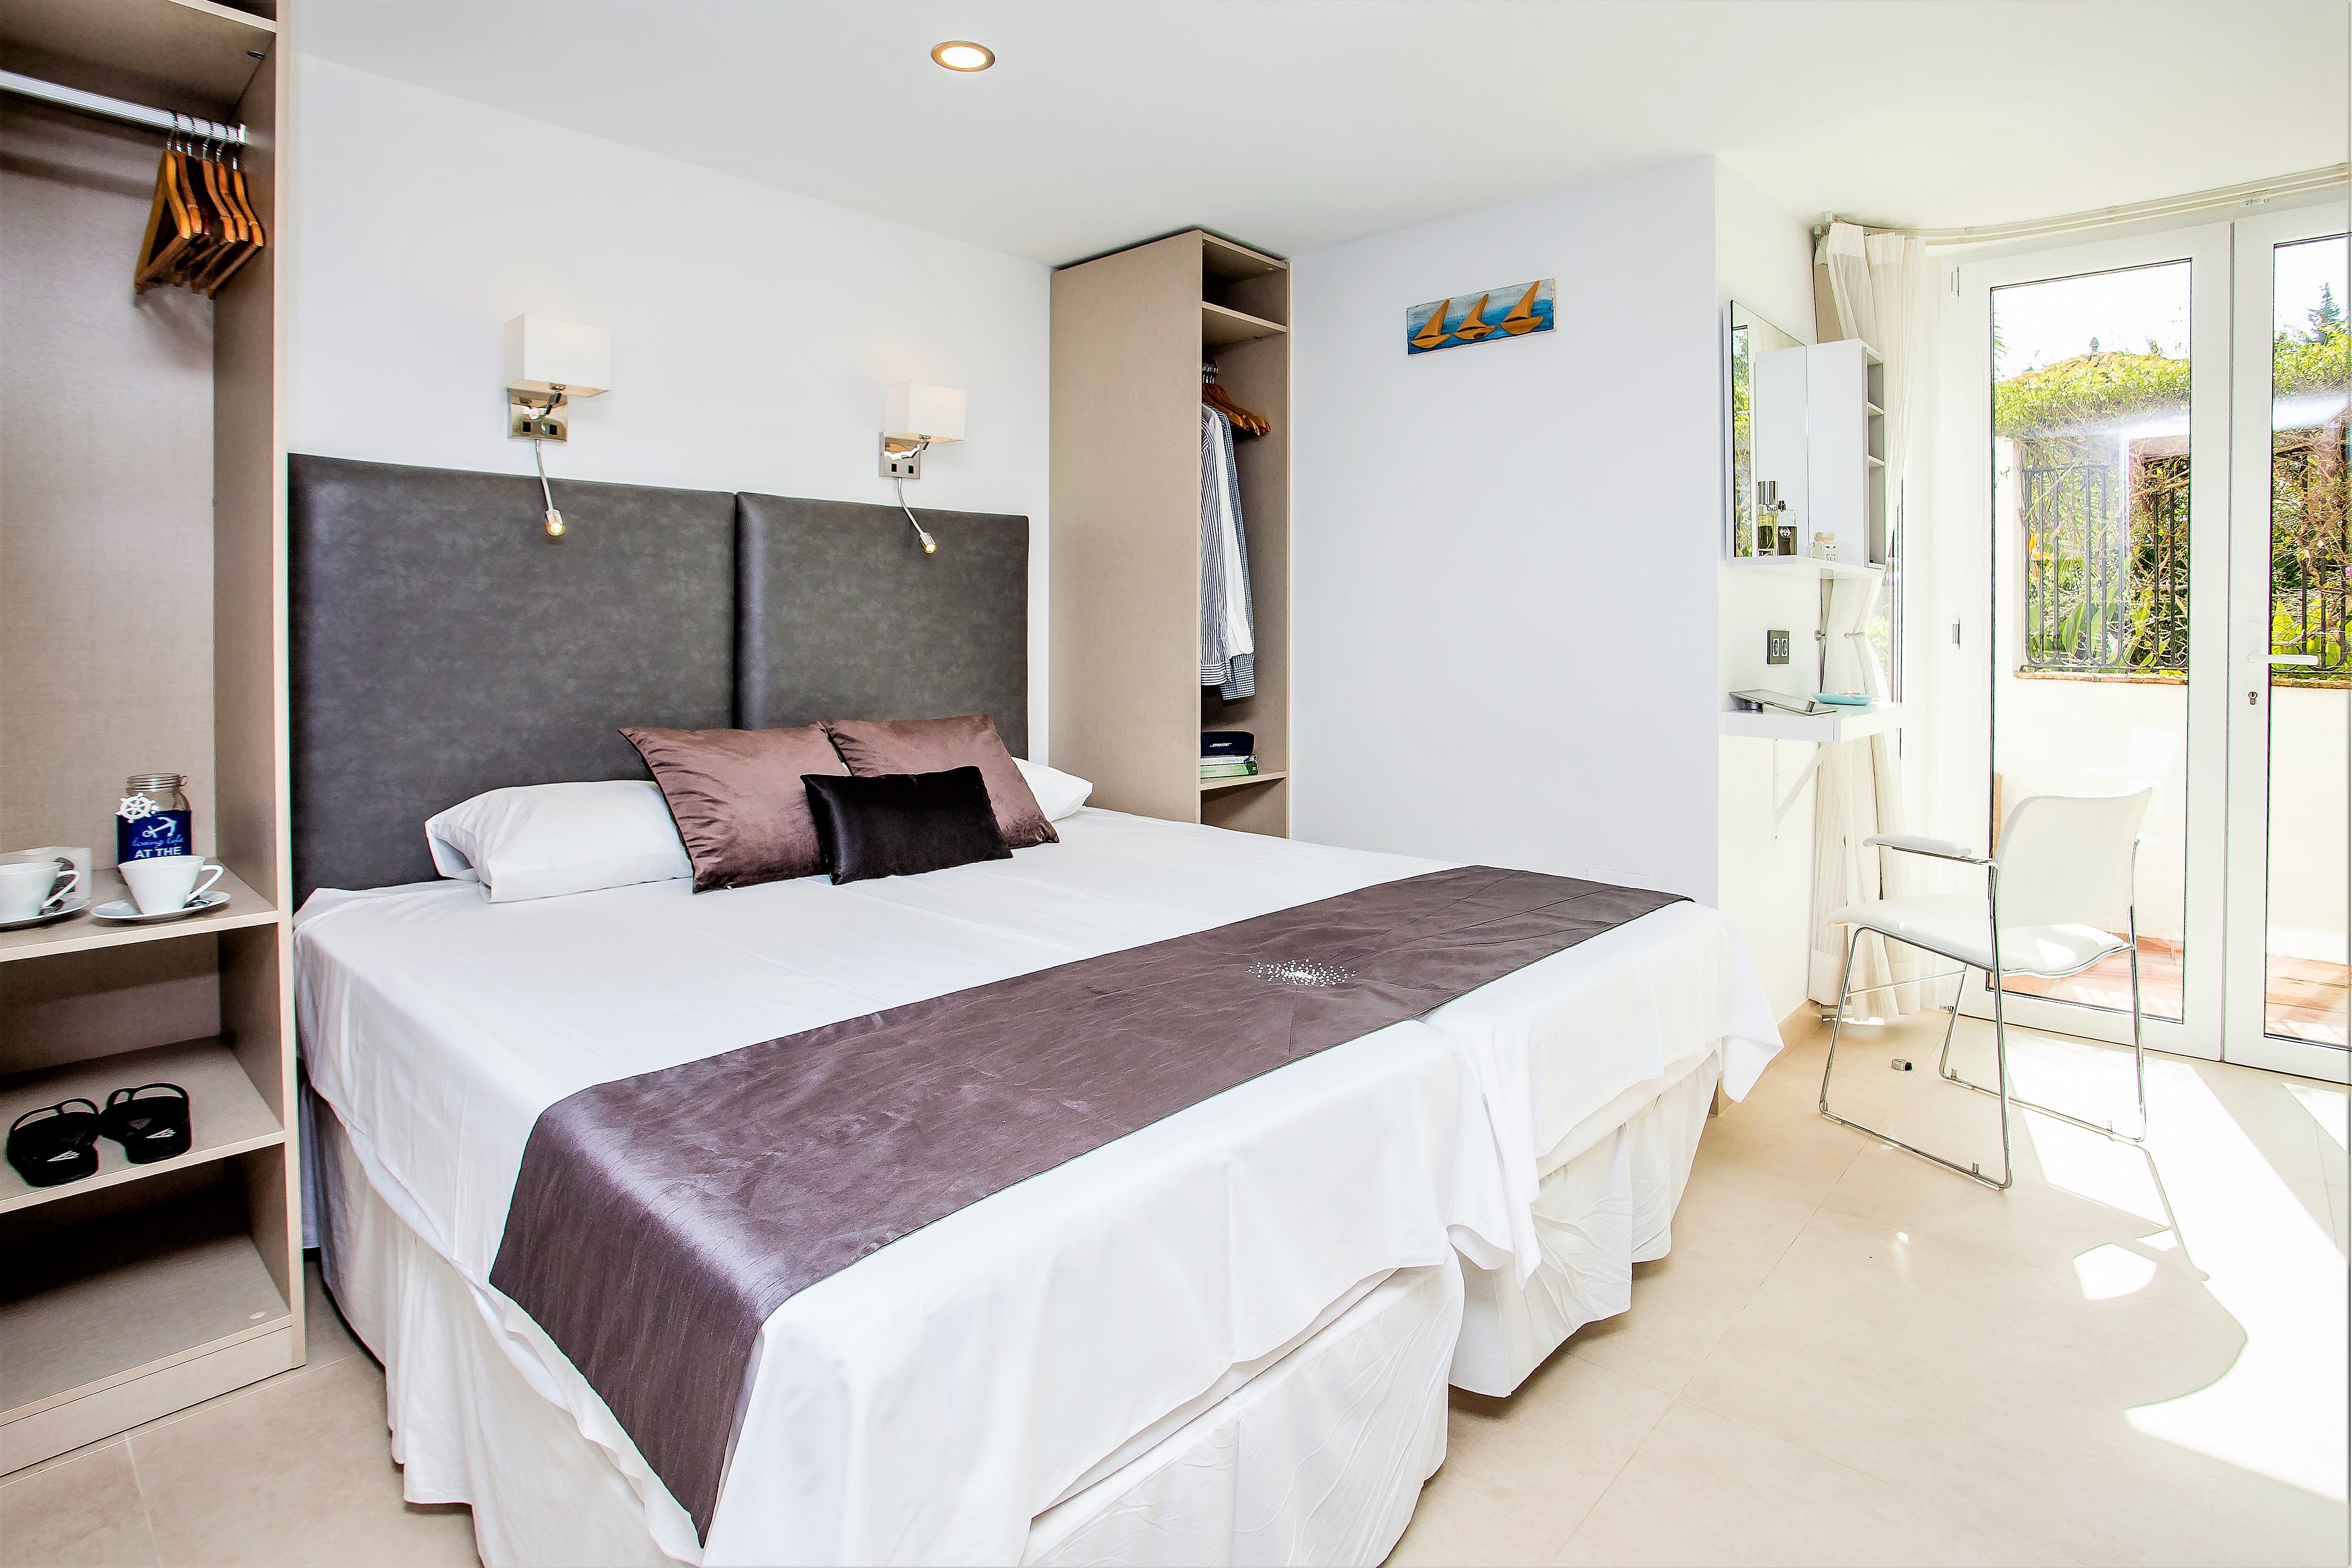 Apartment 4 B R  VILLA by Puerto Banus   Sea 5 m                                photo 20147470